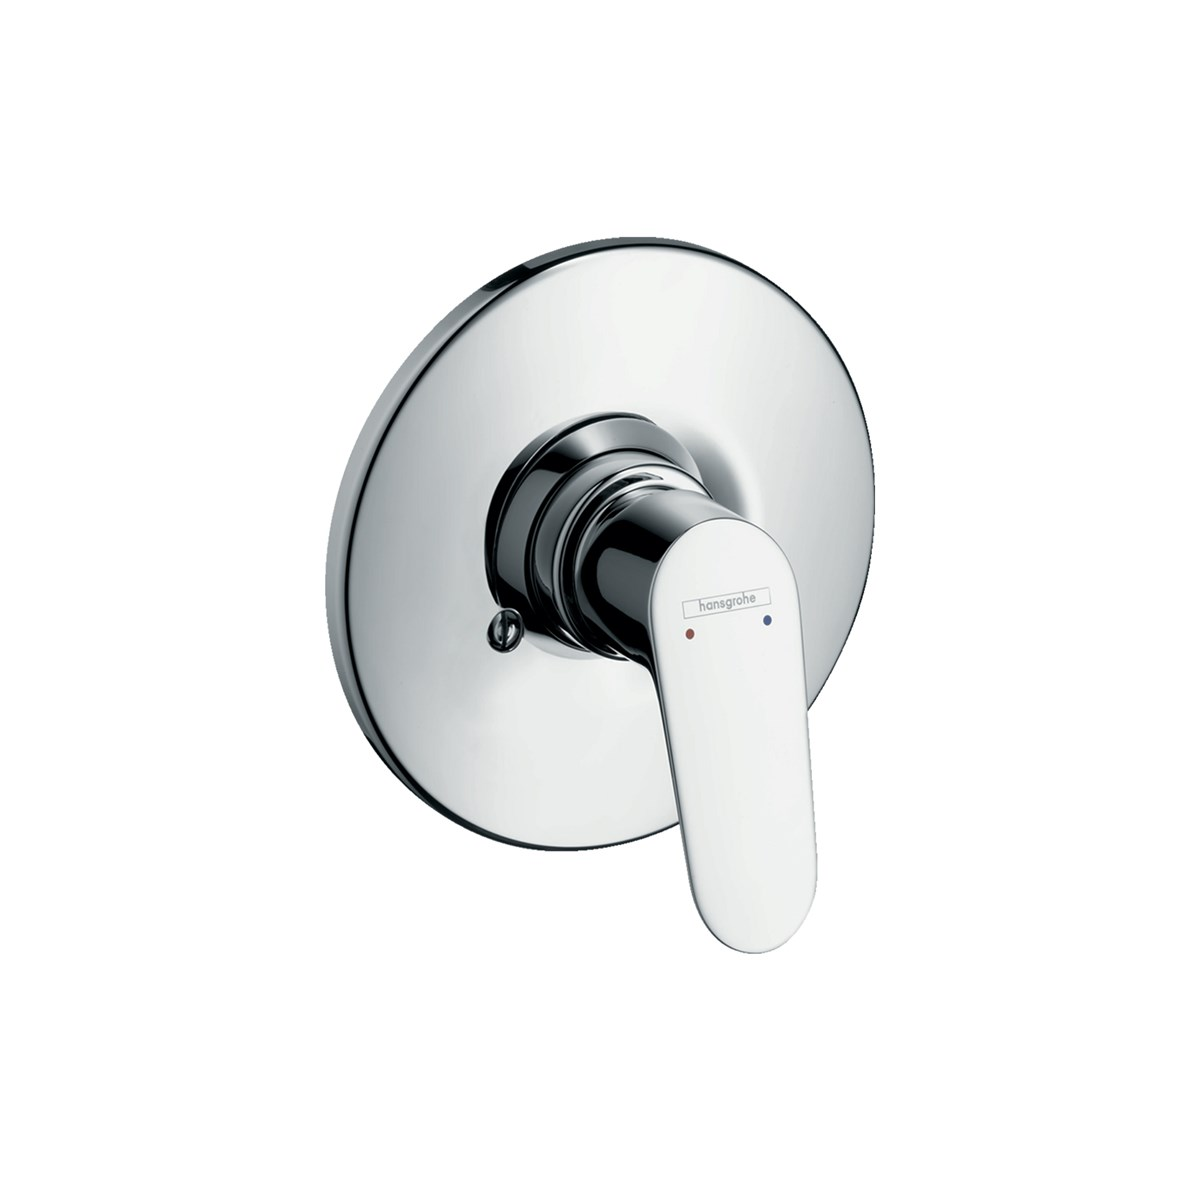 Hansgrohe-Focus-Shower-Mixer-Concealed-31967000-Matisse-1